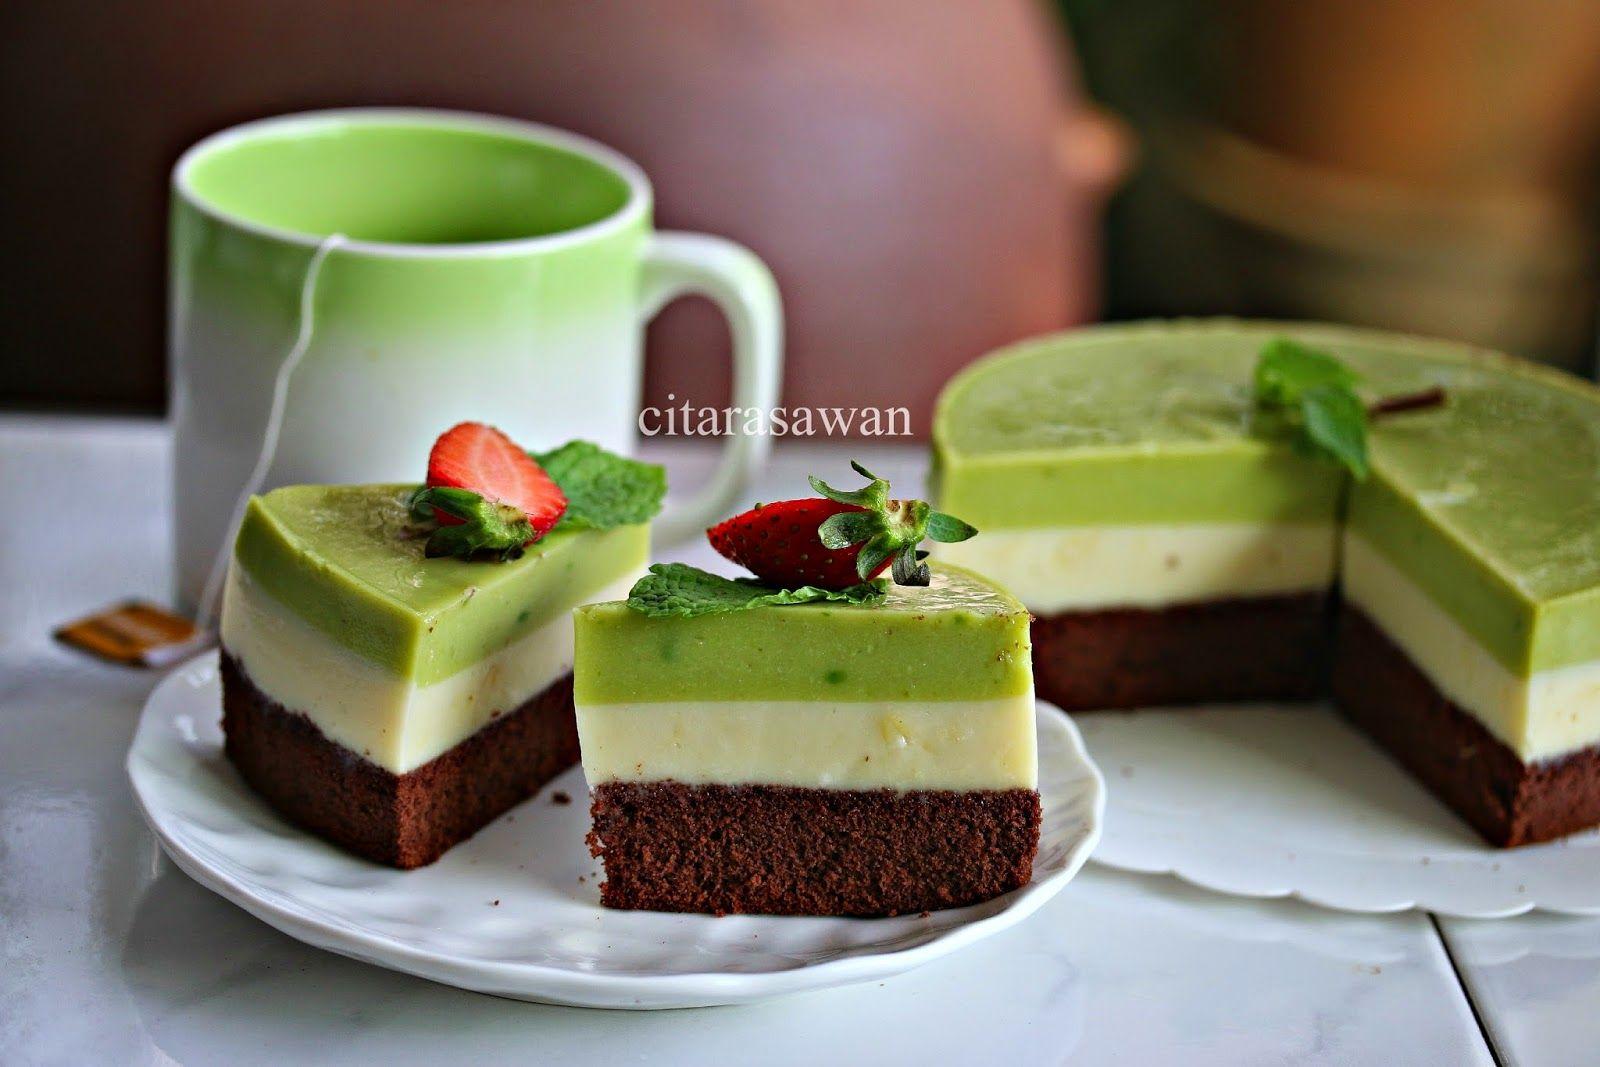 Chocolate Avocado Mousse Cake Resipi Citarasawan Kue Alpukat Coffee Cake Makanan